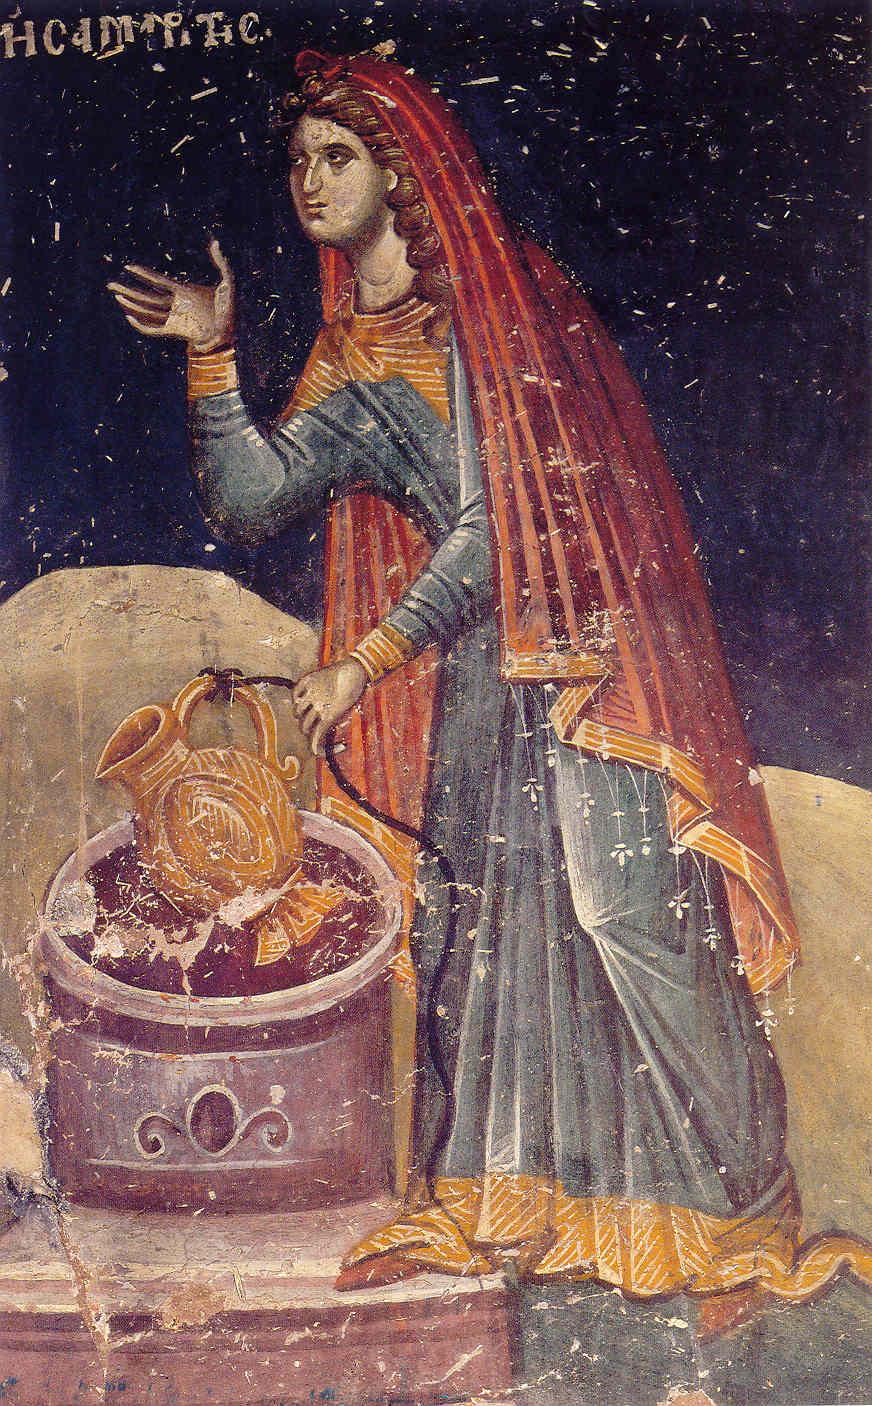 St. Photini, the Samaritan Woman